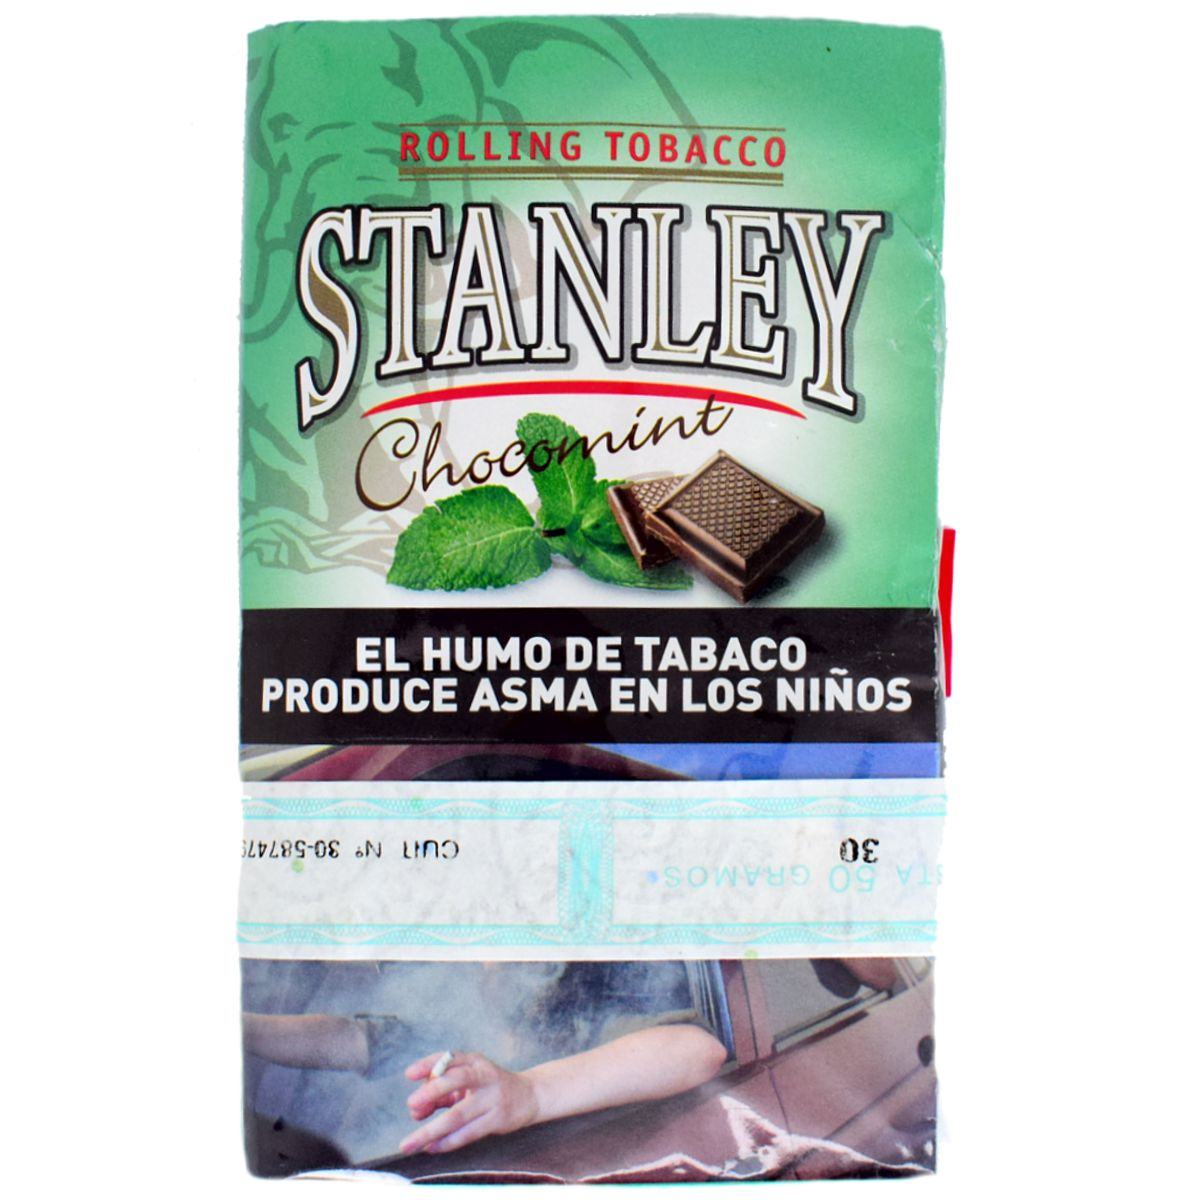 tabaco stanley chocomint venta online